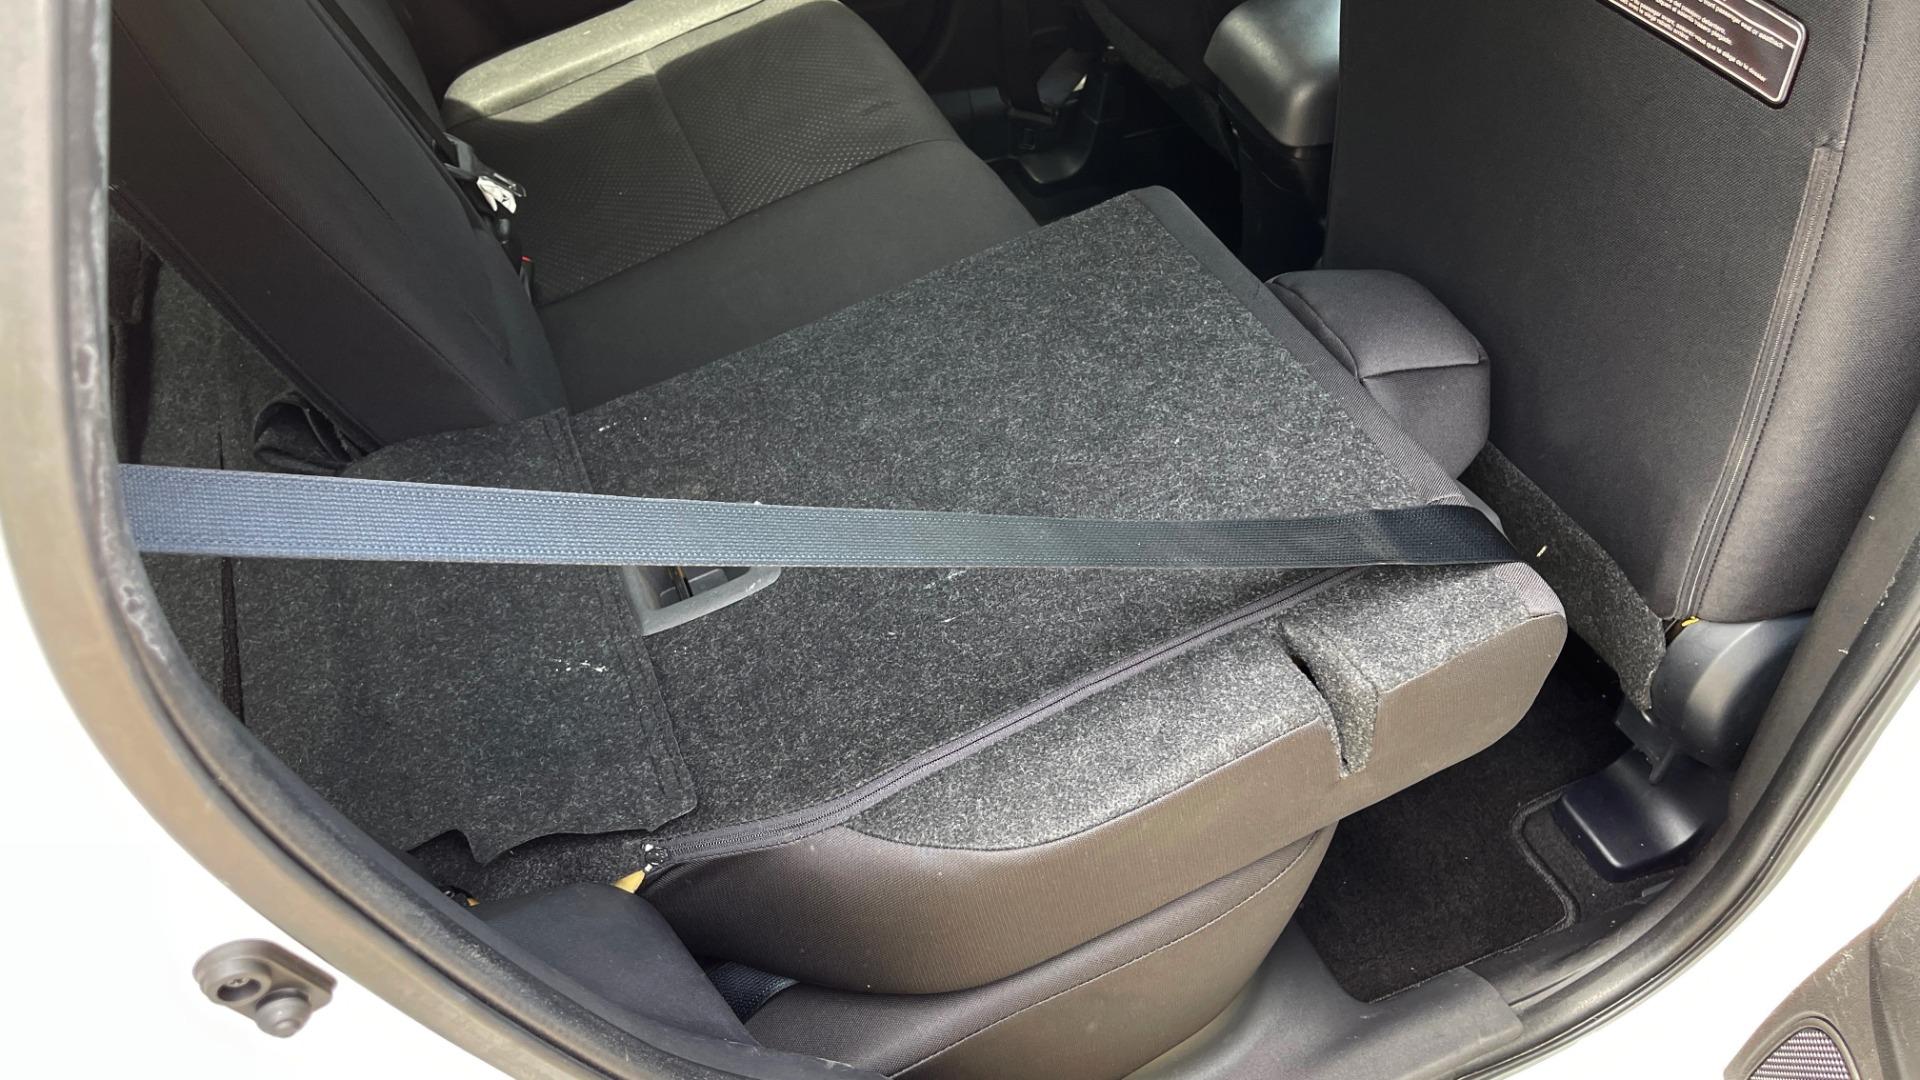 Used 2014 Mitsubishi OUTLANDER SPORT ES 2WD / 2.0L / CVT TRANS / 18IN WHEELS / 31MPG for sale $8,495 at Formula Imports in Charlotte NC 28227 51